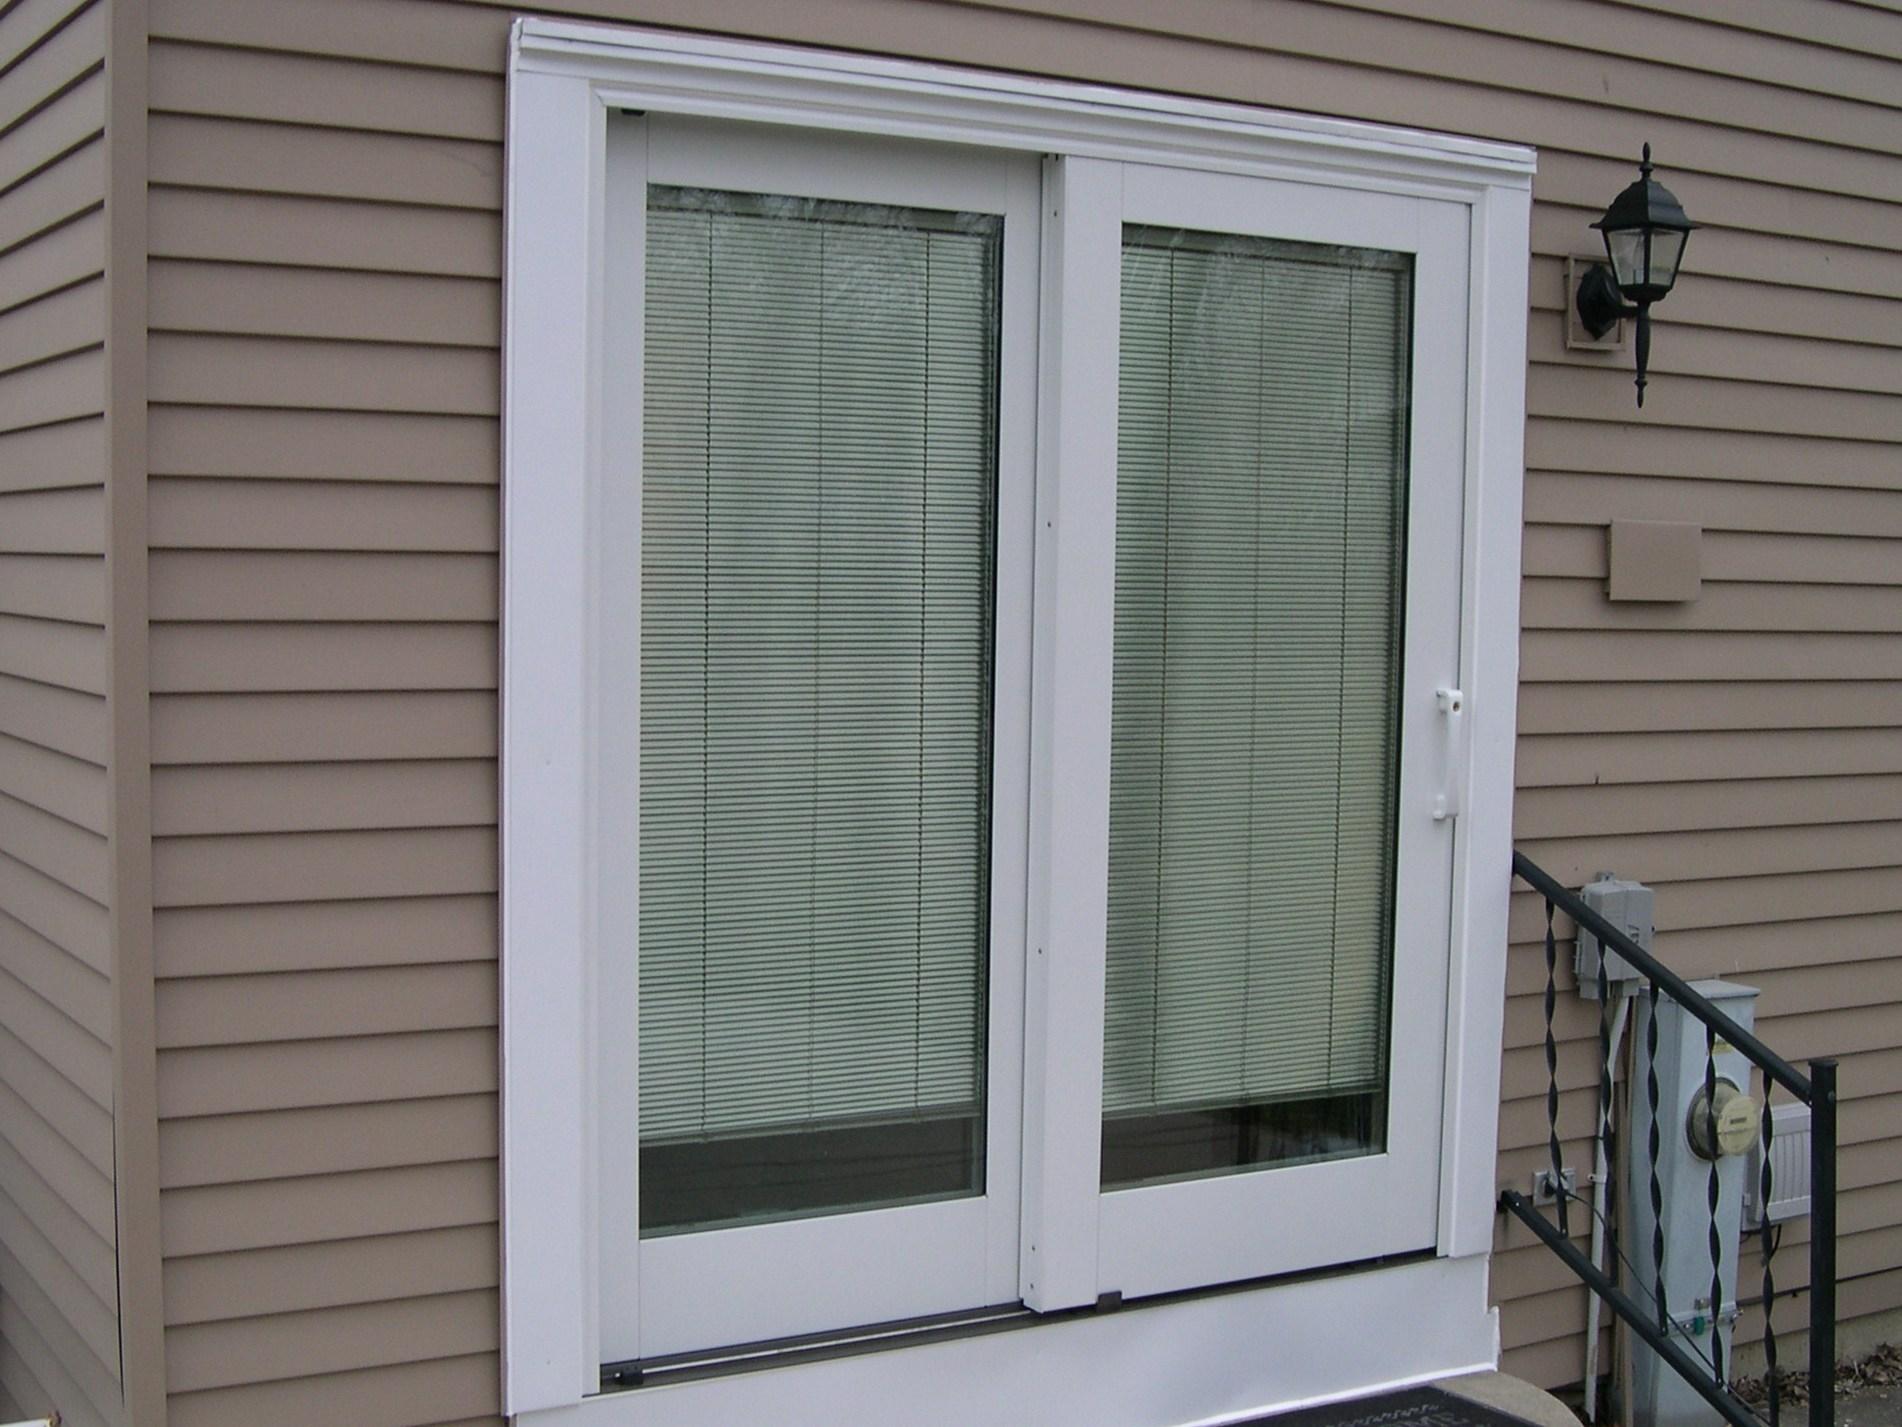 Pella Sliding Doors With Mini Blindssliding doors with blinds